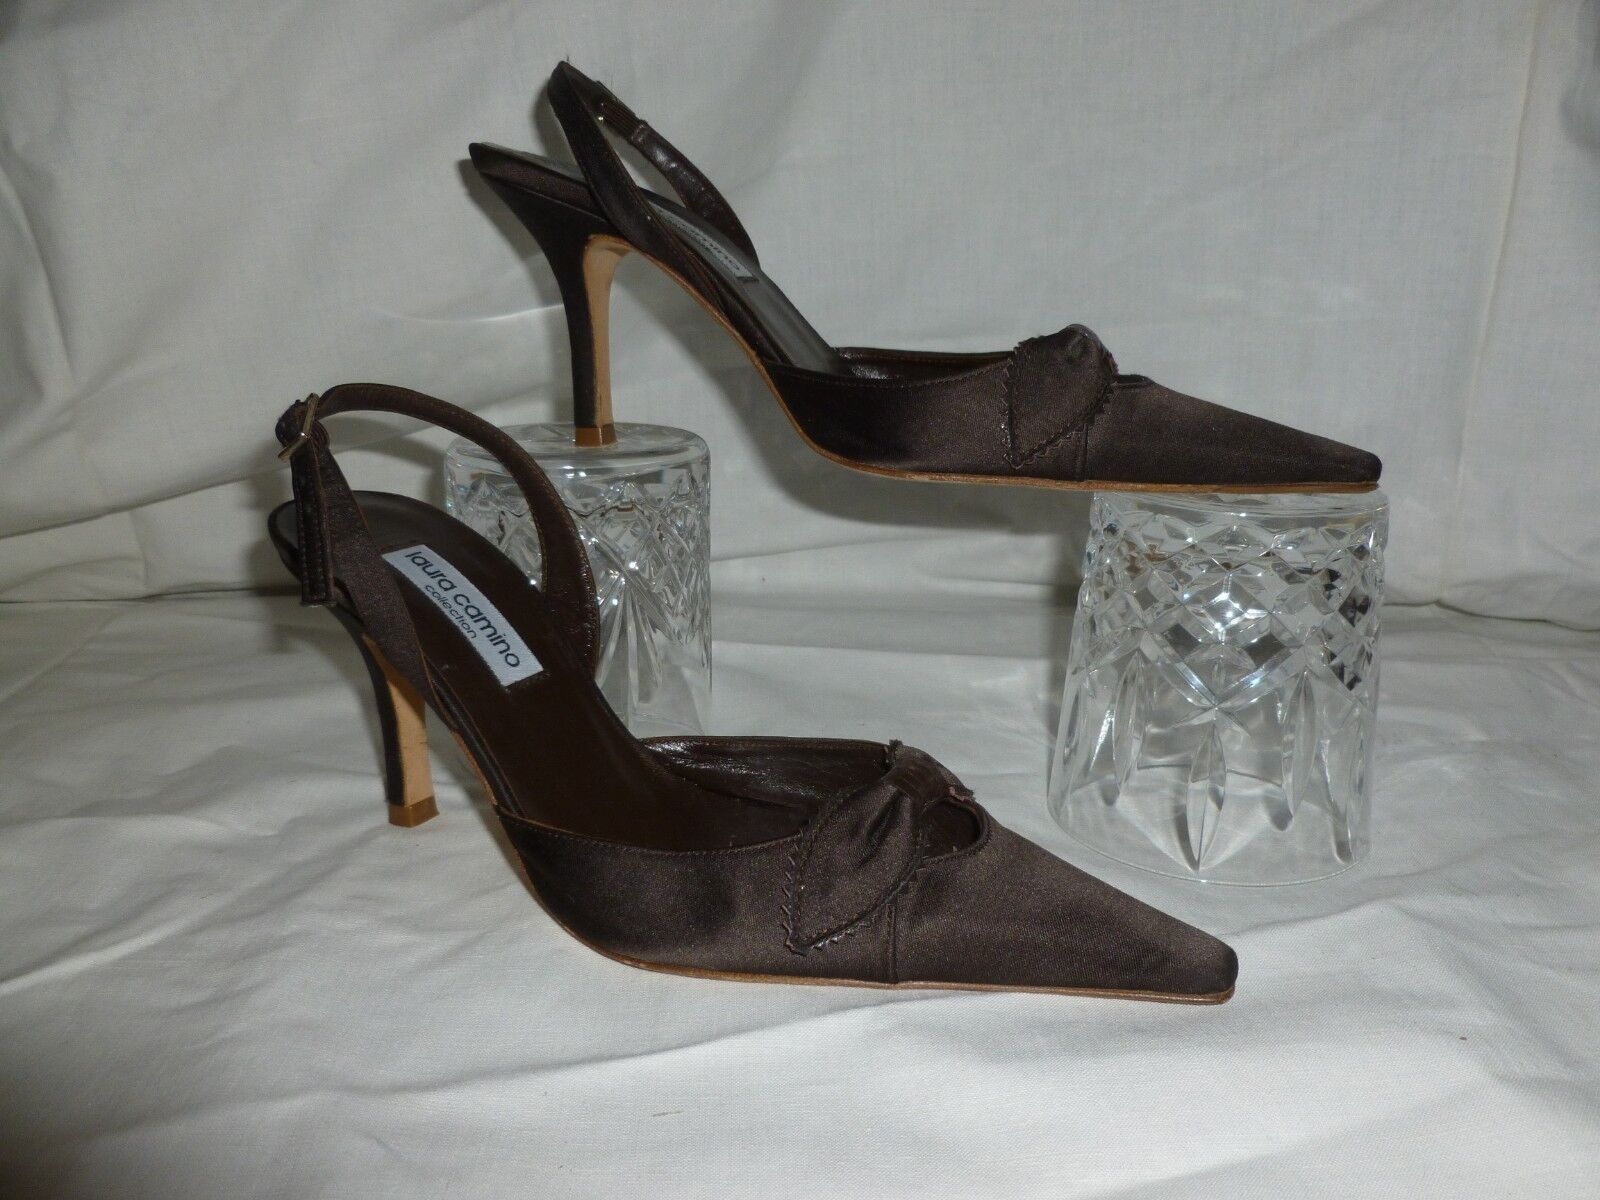 LAURA CAMINO Marron sling back Chaussures UK 3.5 EU 36